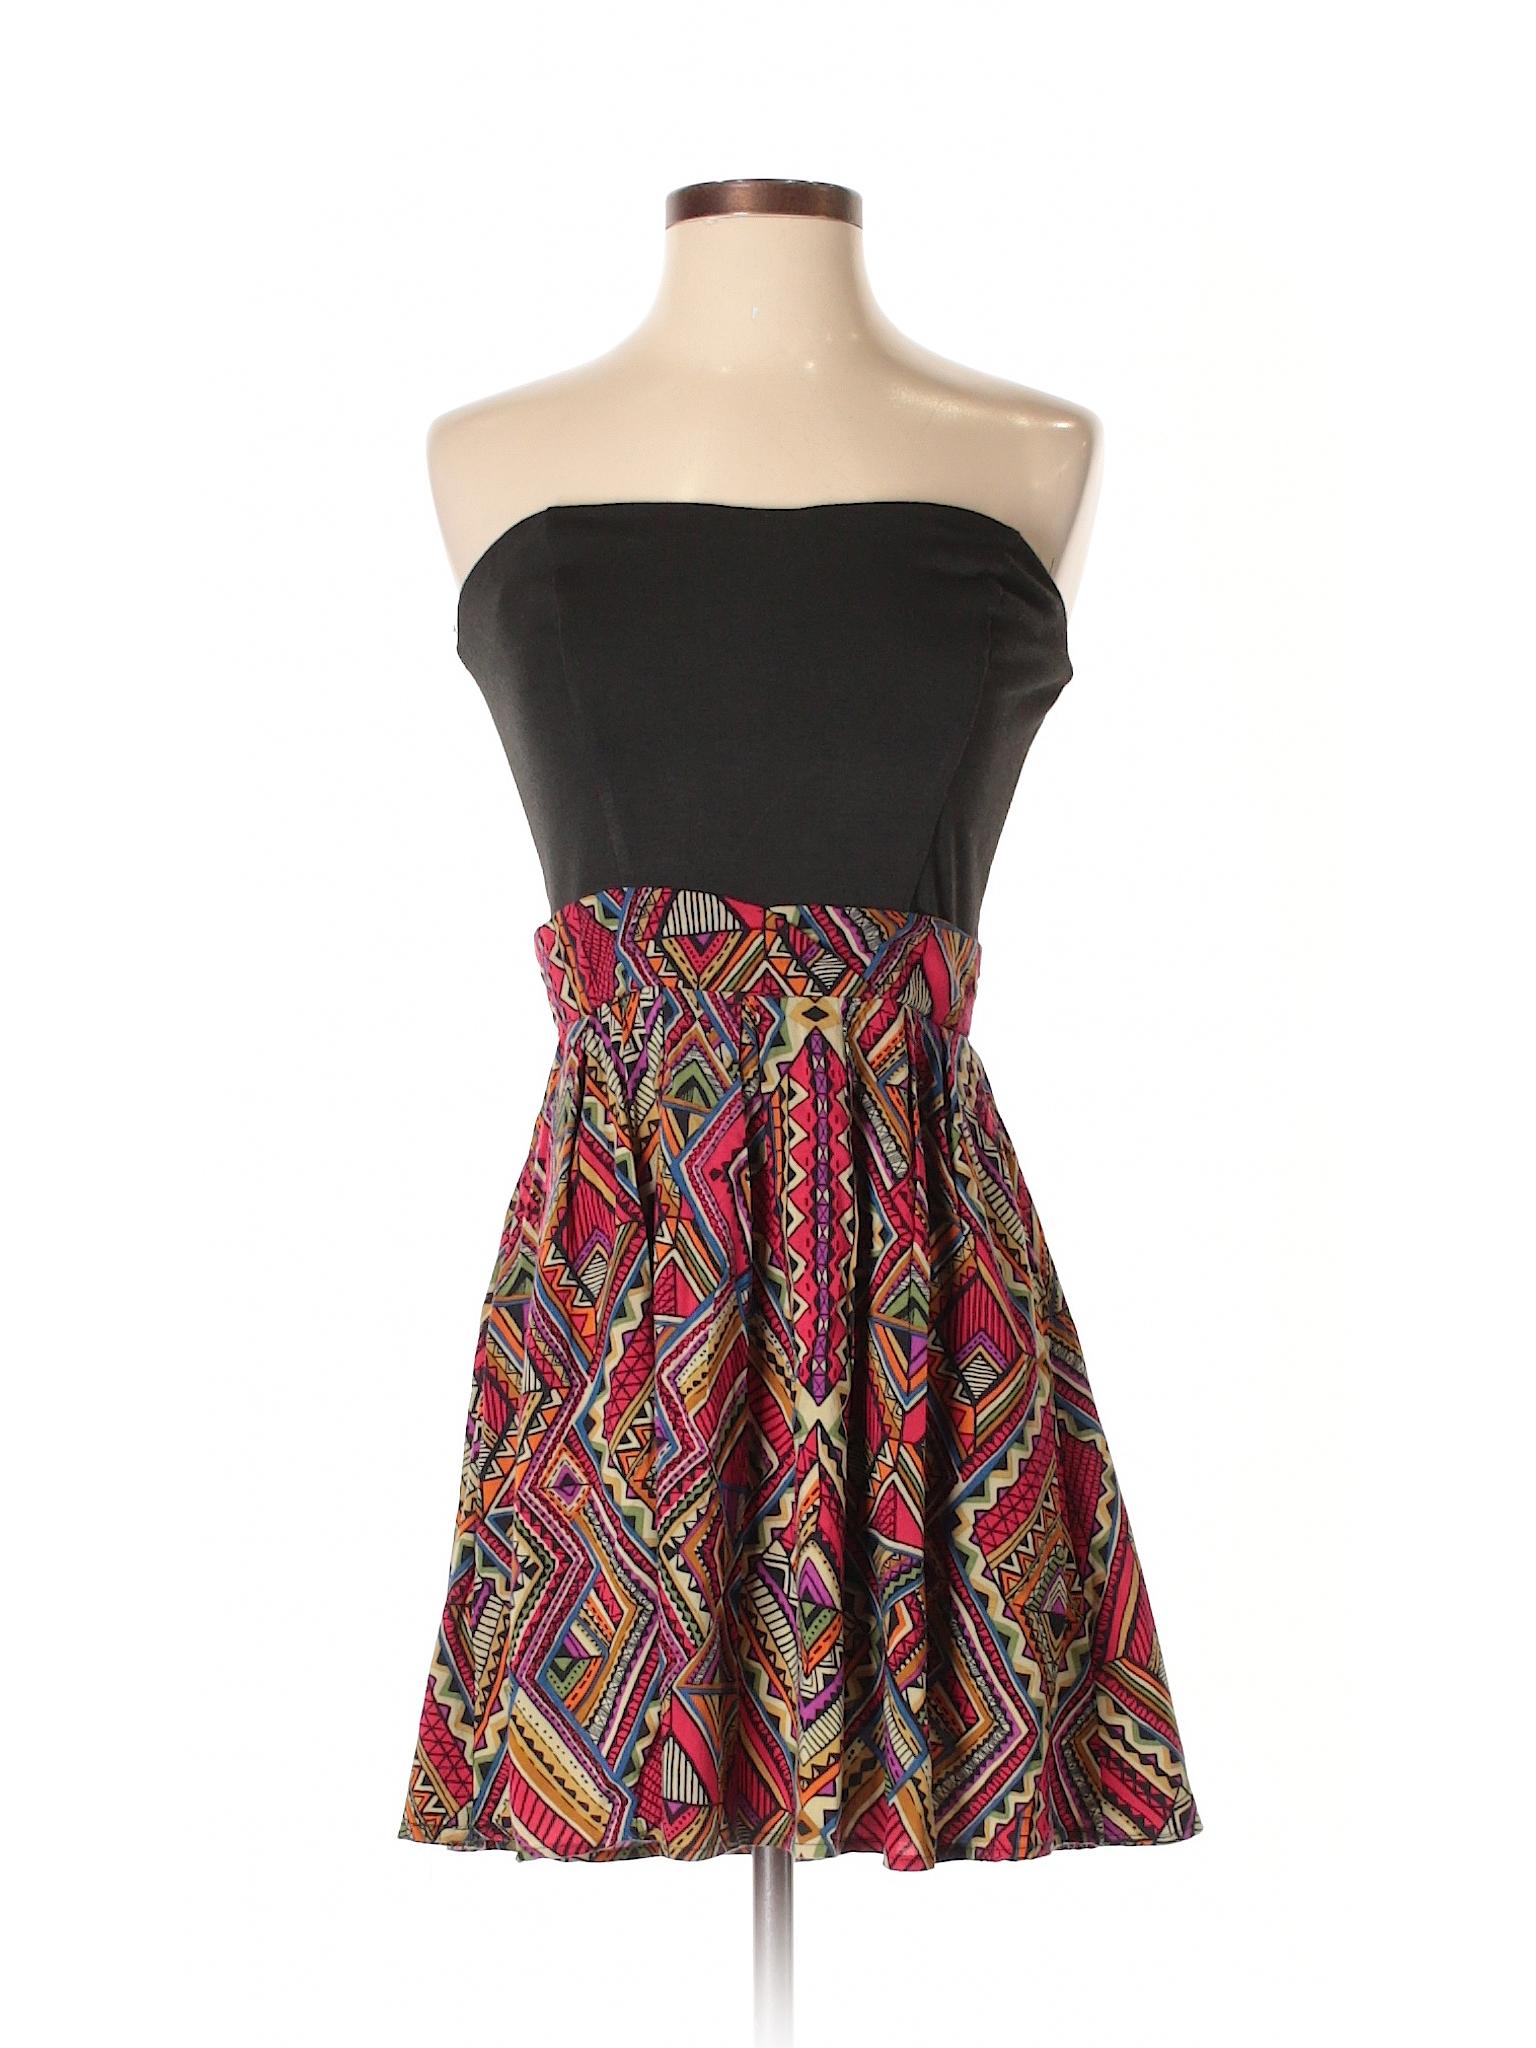 Boutique winter Dress winter Casual Xhilaration Dress Xhilaration Casual Boutique tqwExxSzB